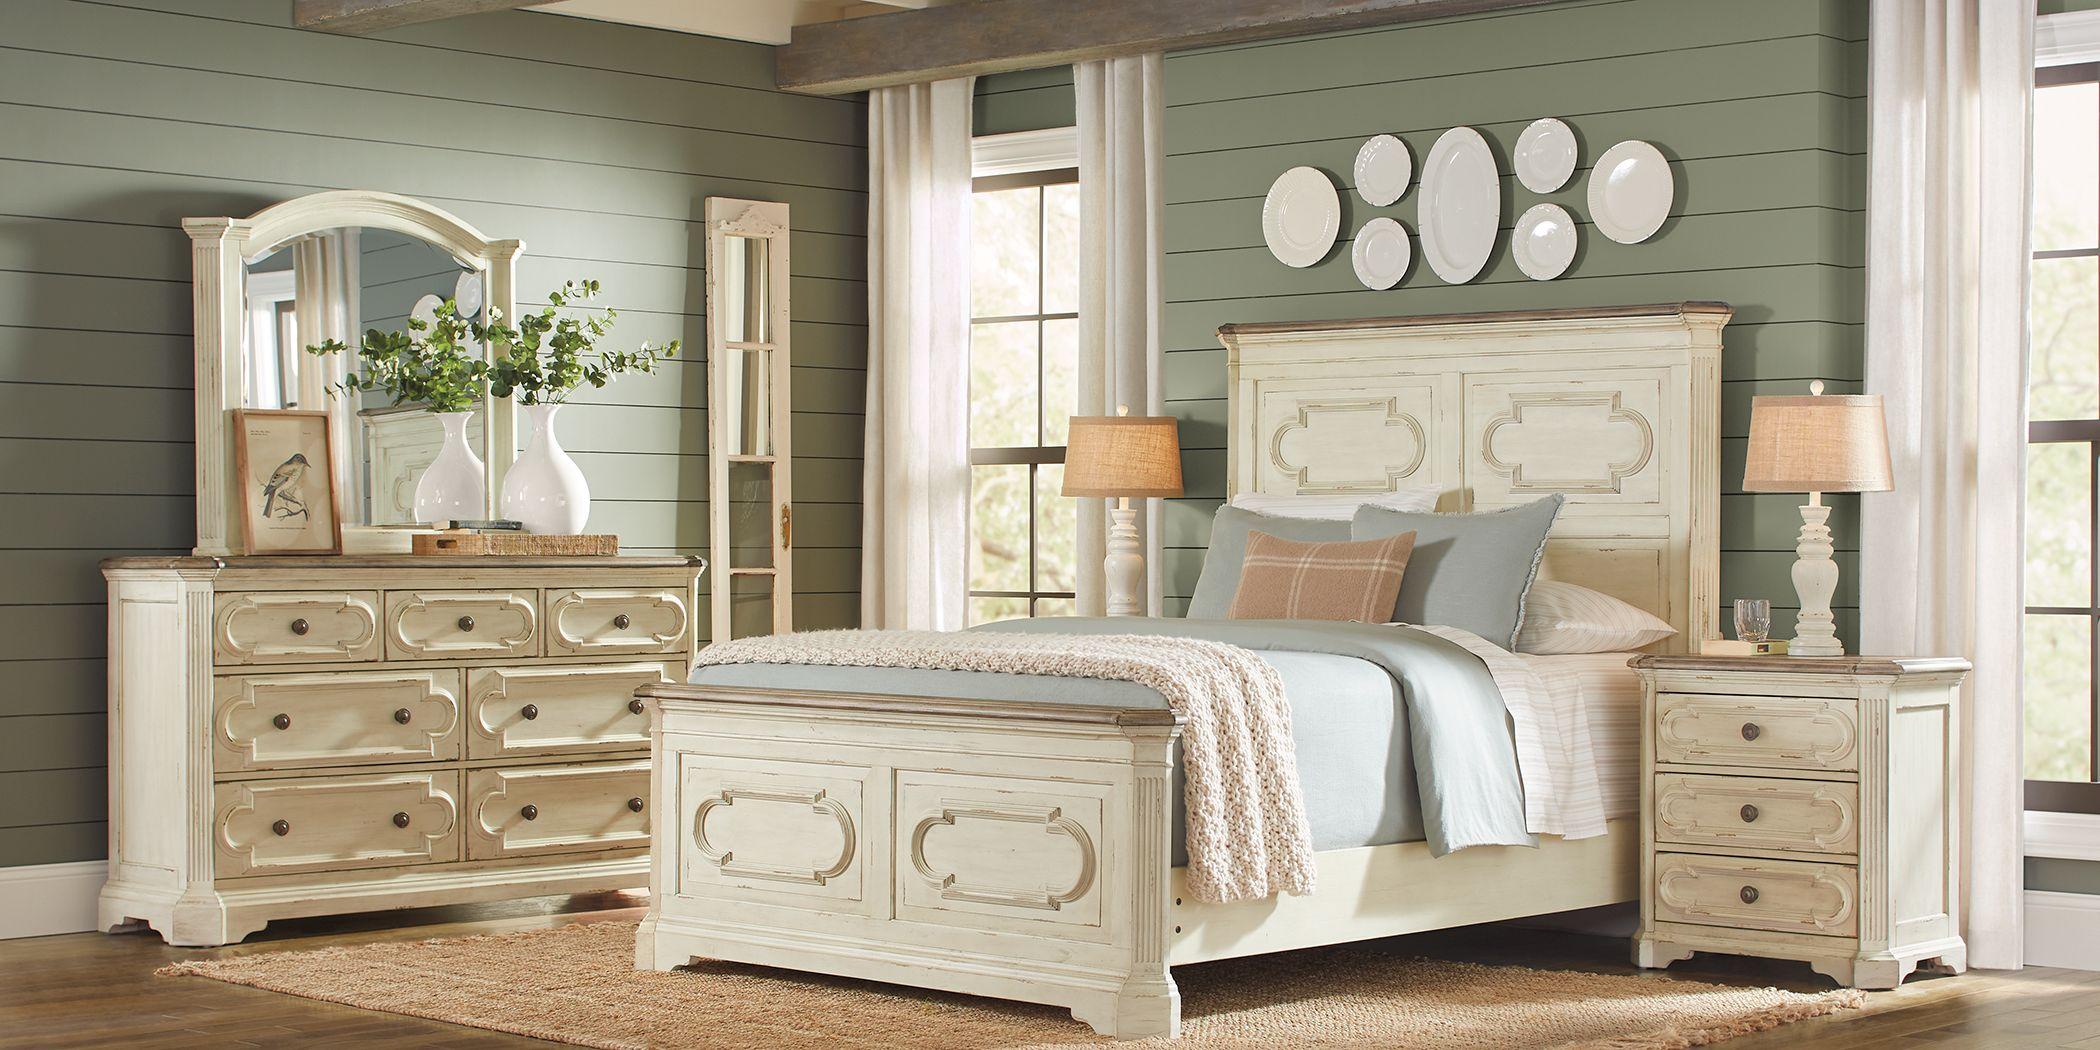 Lindenwood White 4 Pc King Panel Bedroom